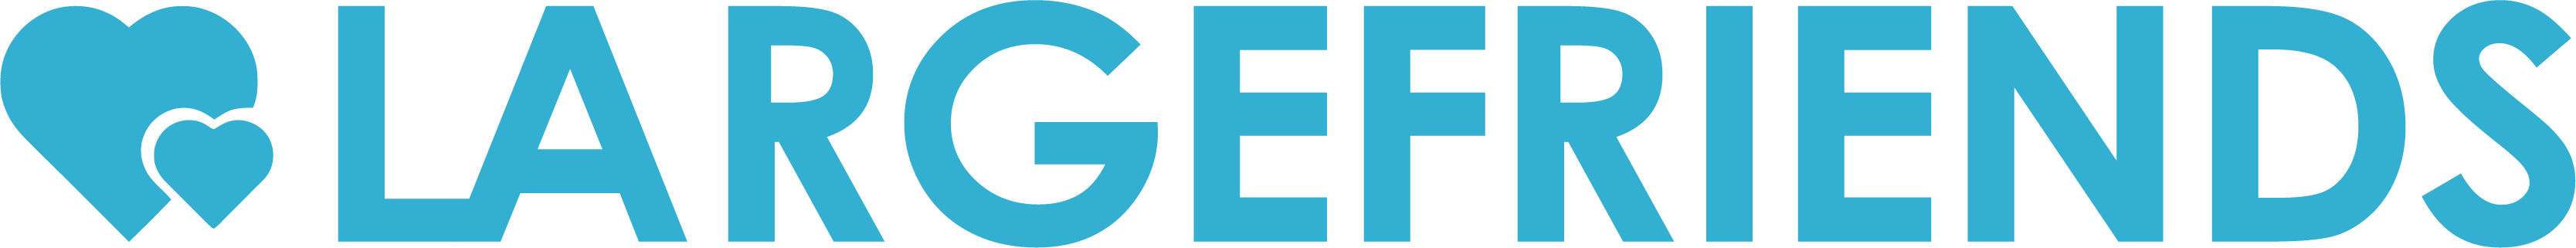 LargeFriends Logo